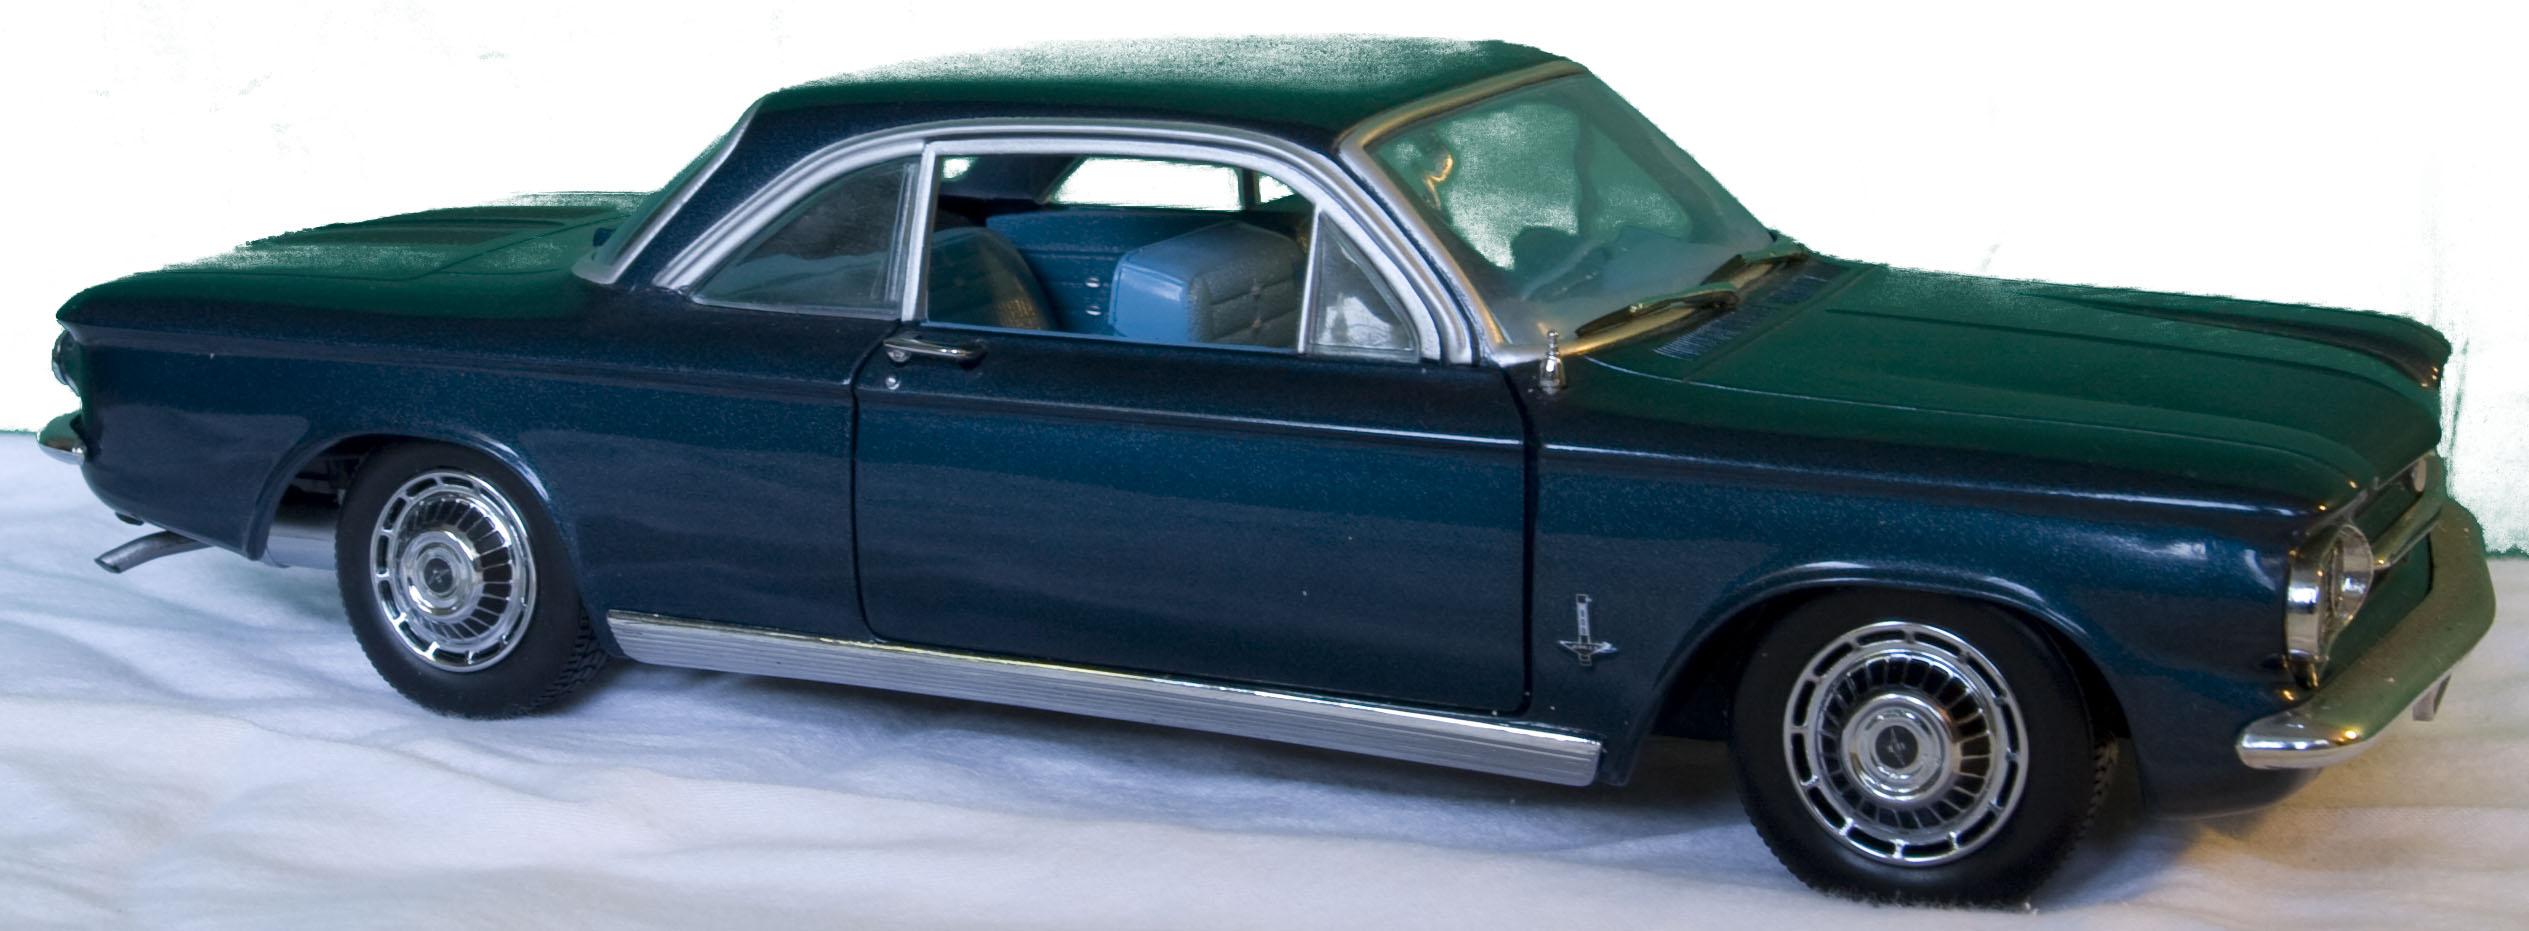 Gianpieros blog Chevrolet  Corvair 900 Monza Californian 1963